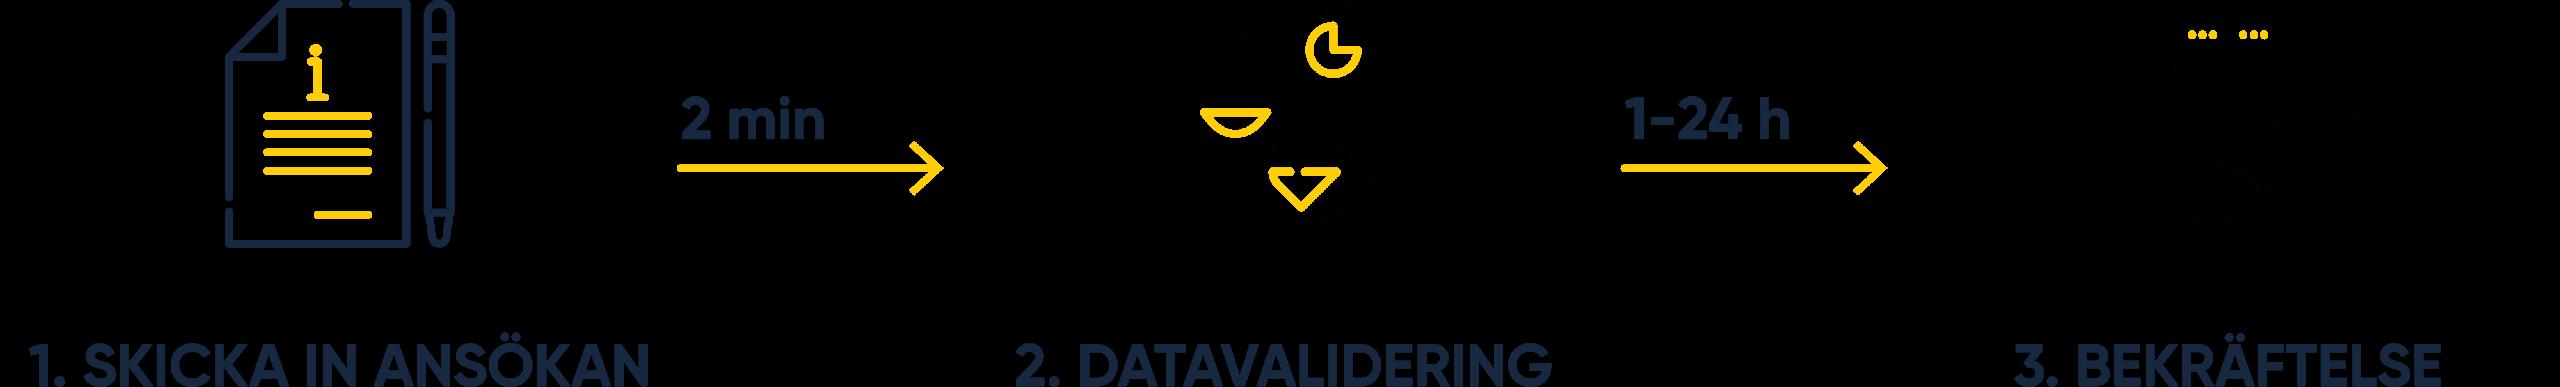 LEI kod registrering i Sverige